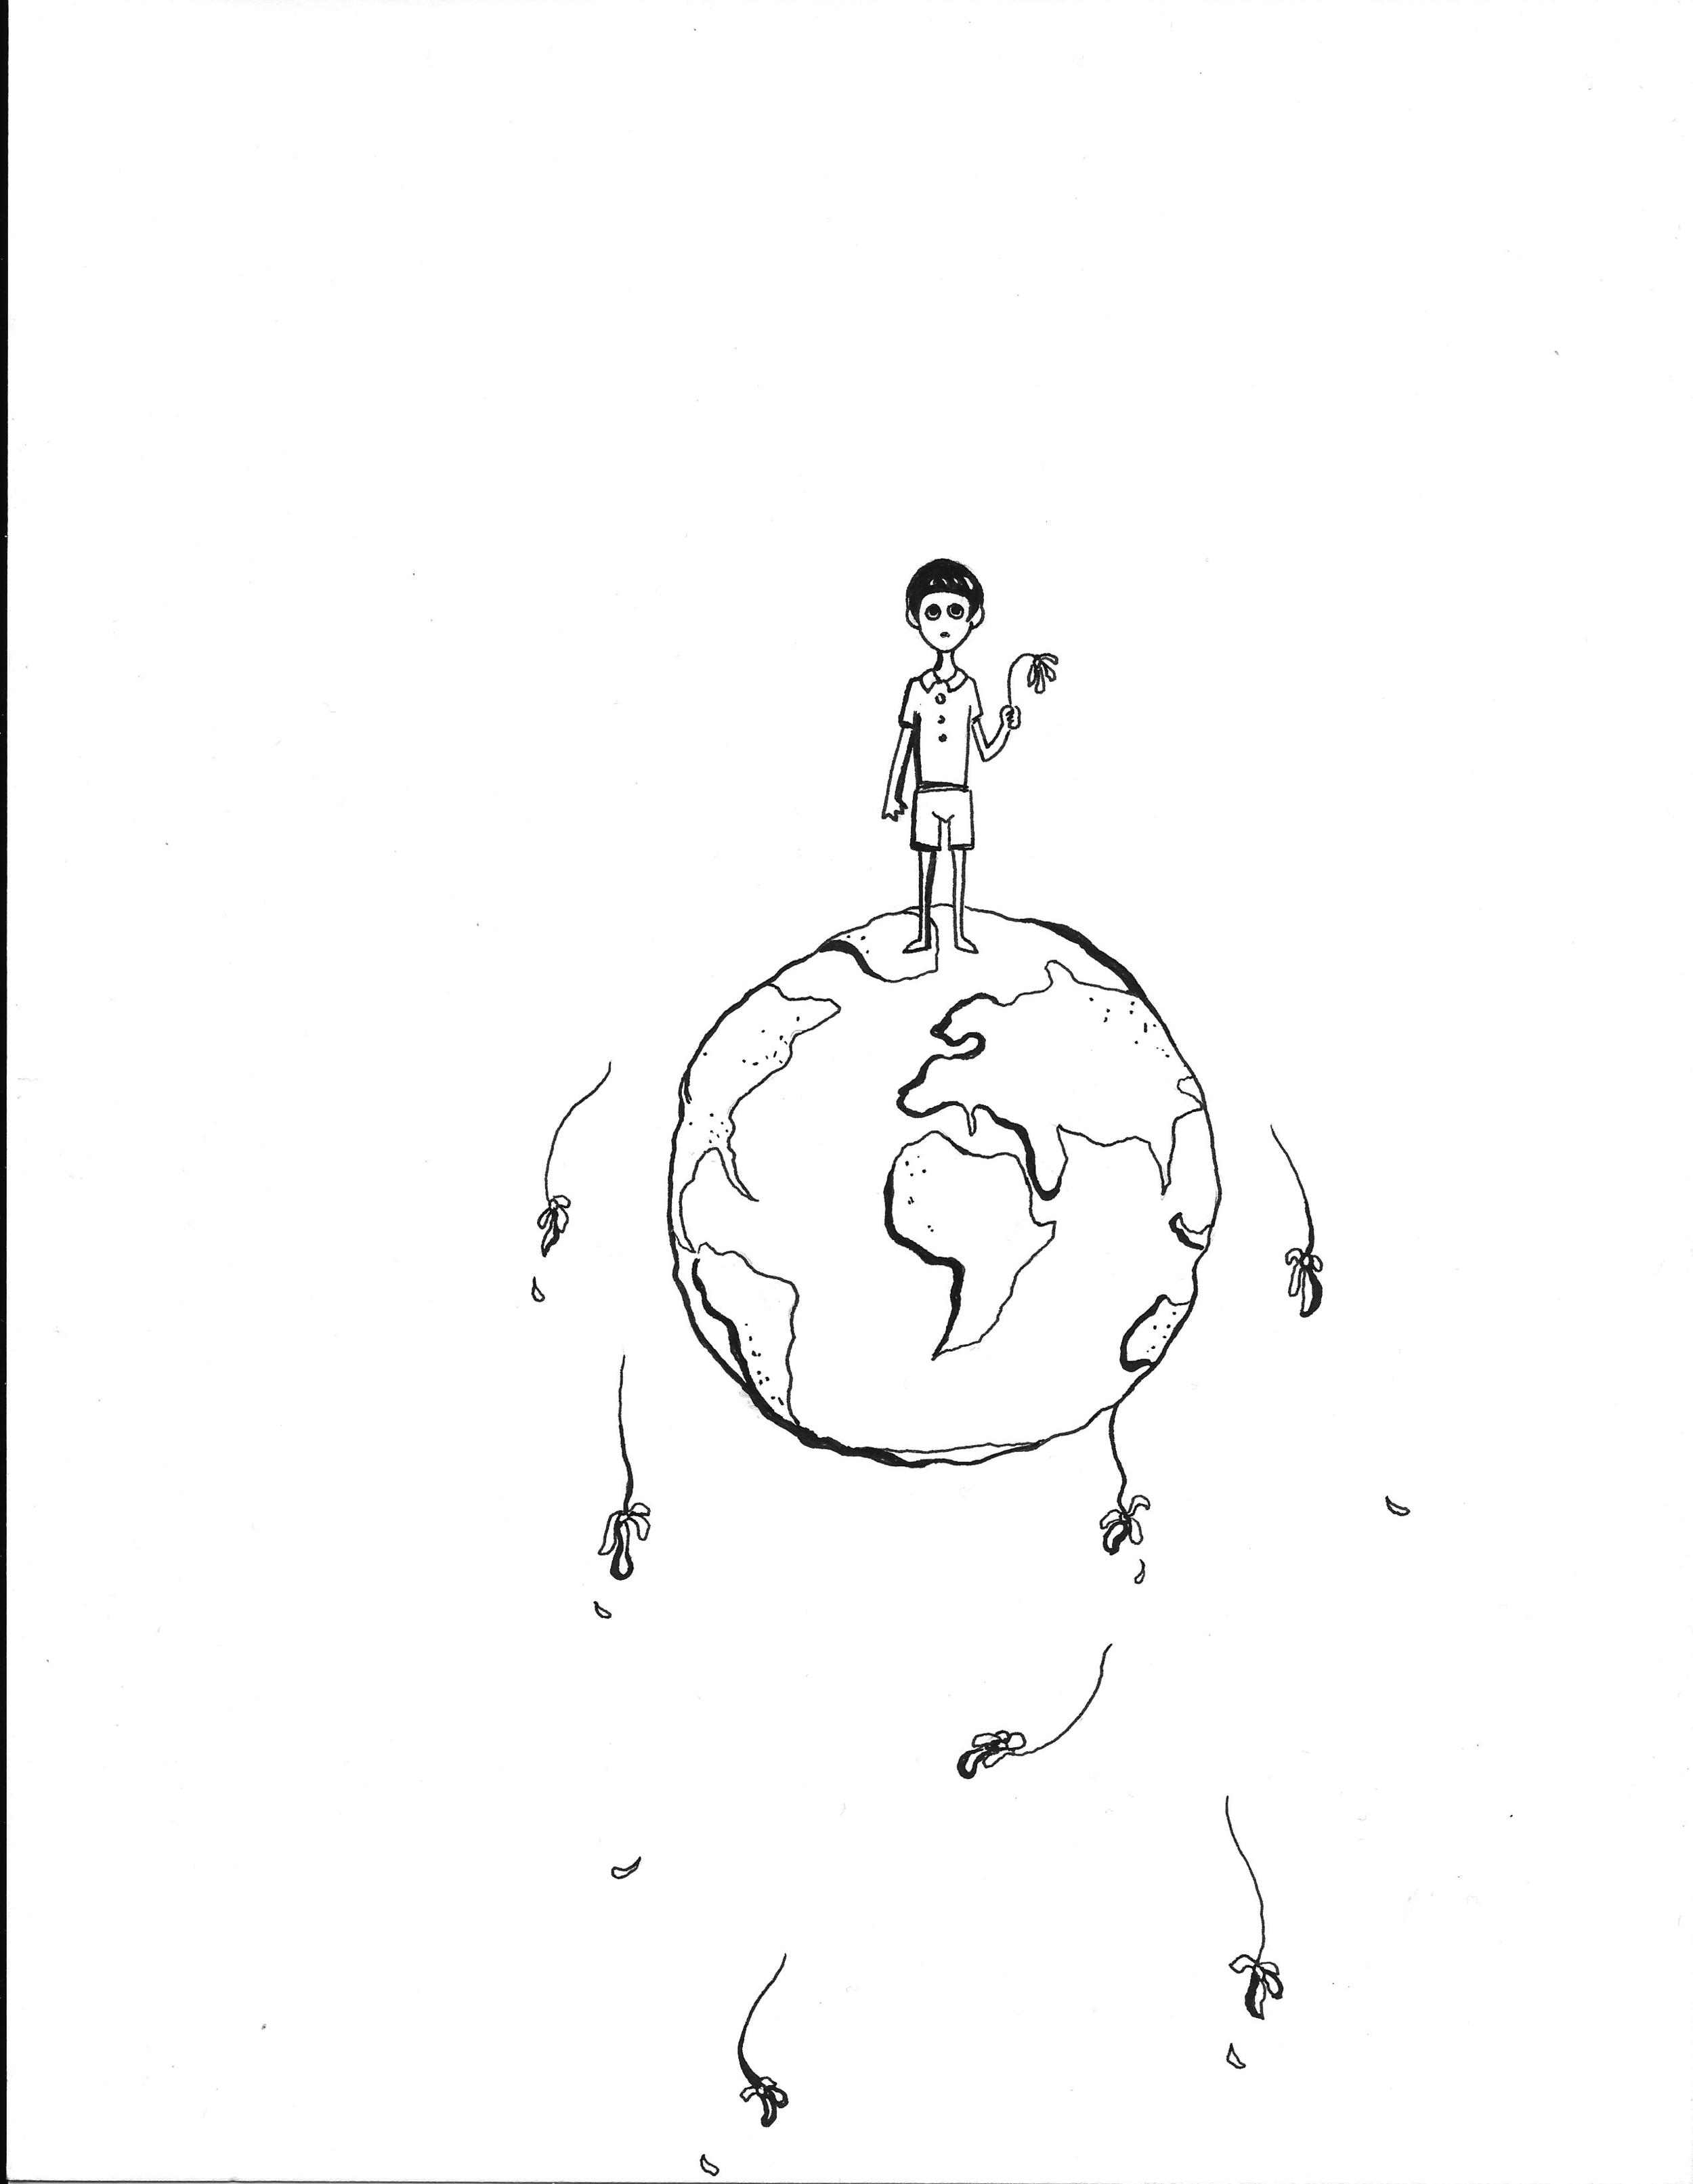 Dance On Bones by David White Illustration p.4